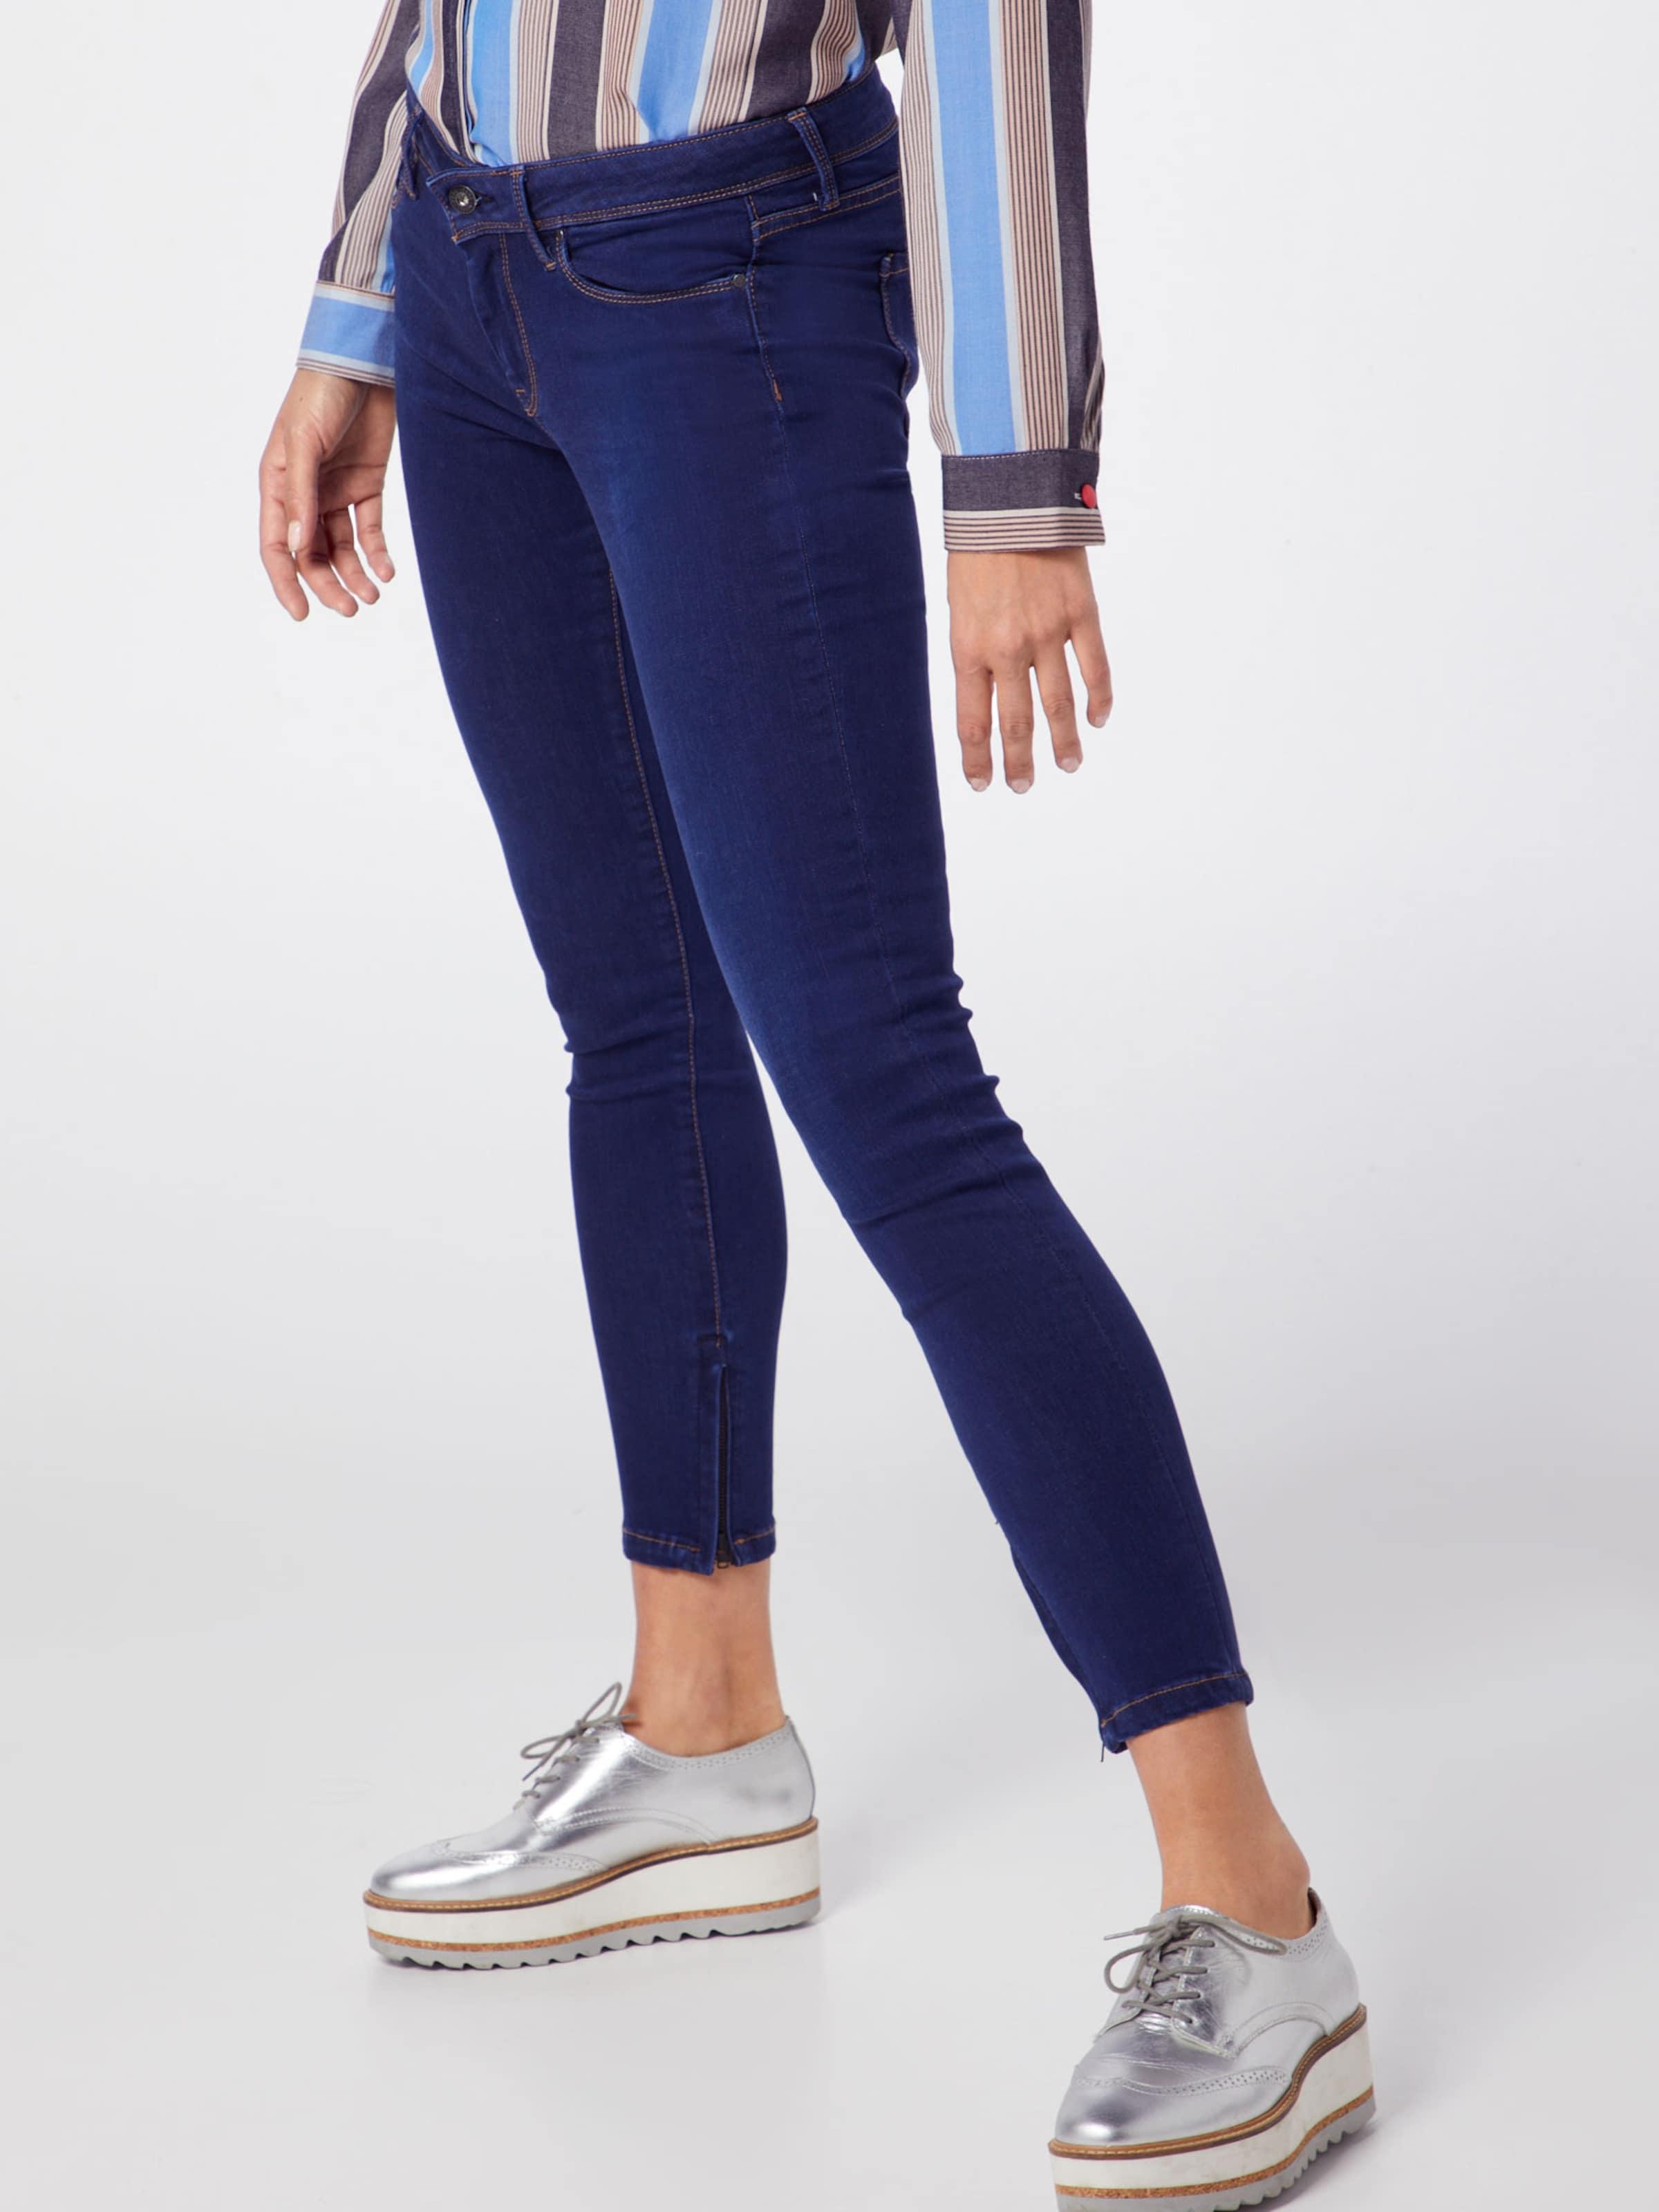 Pepe Denim Jeans Bleu 'cher' En Jean N0nwOZkX8P